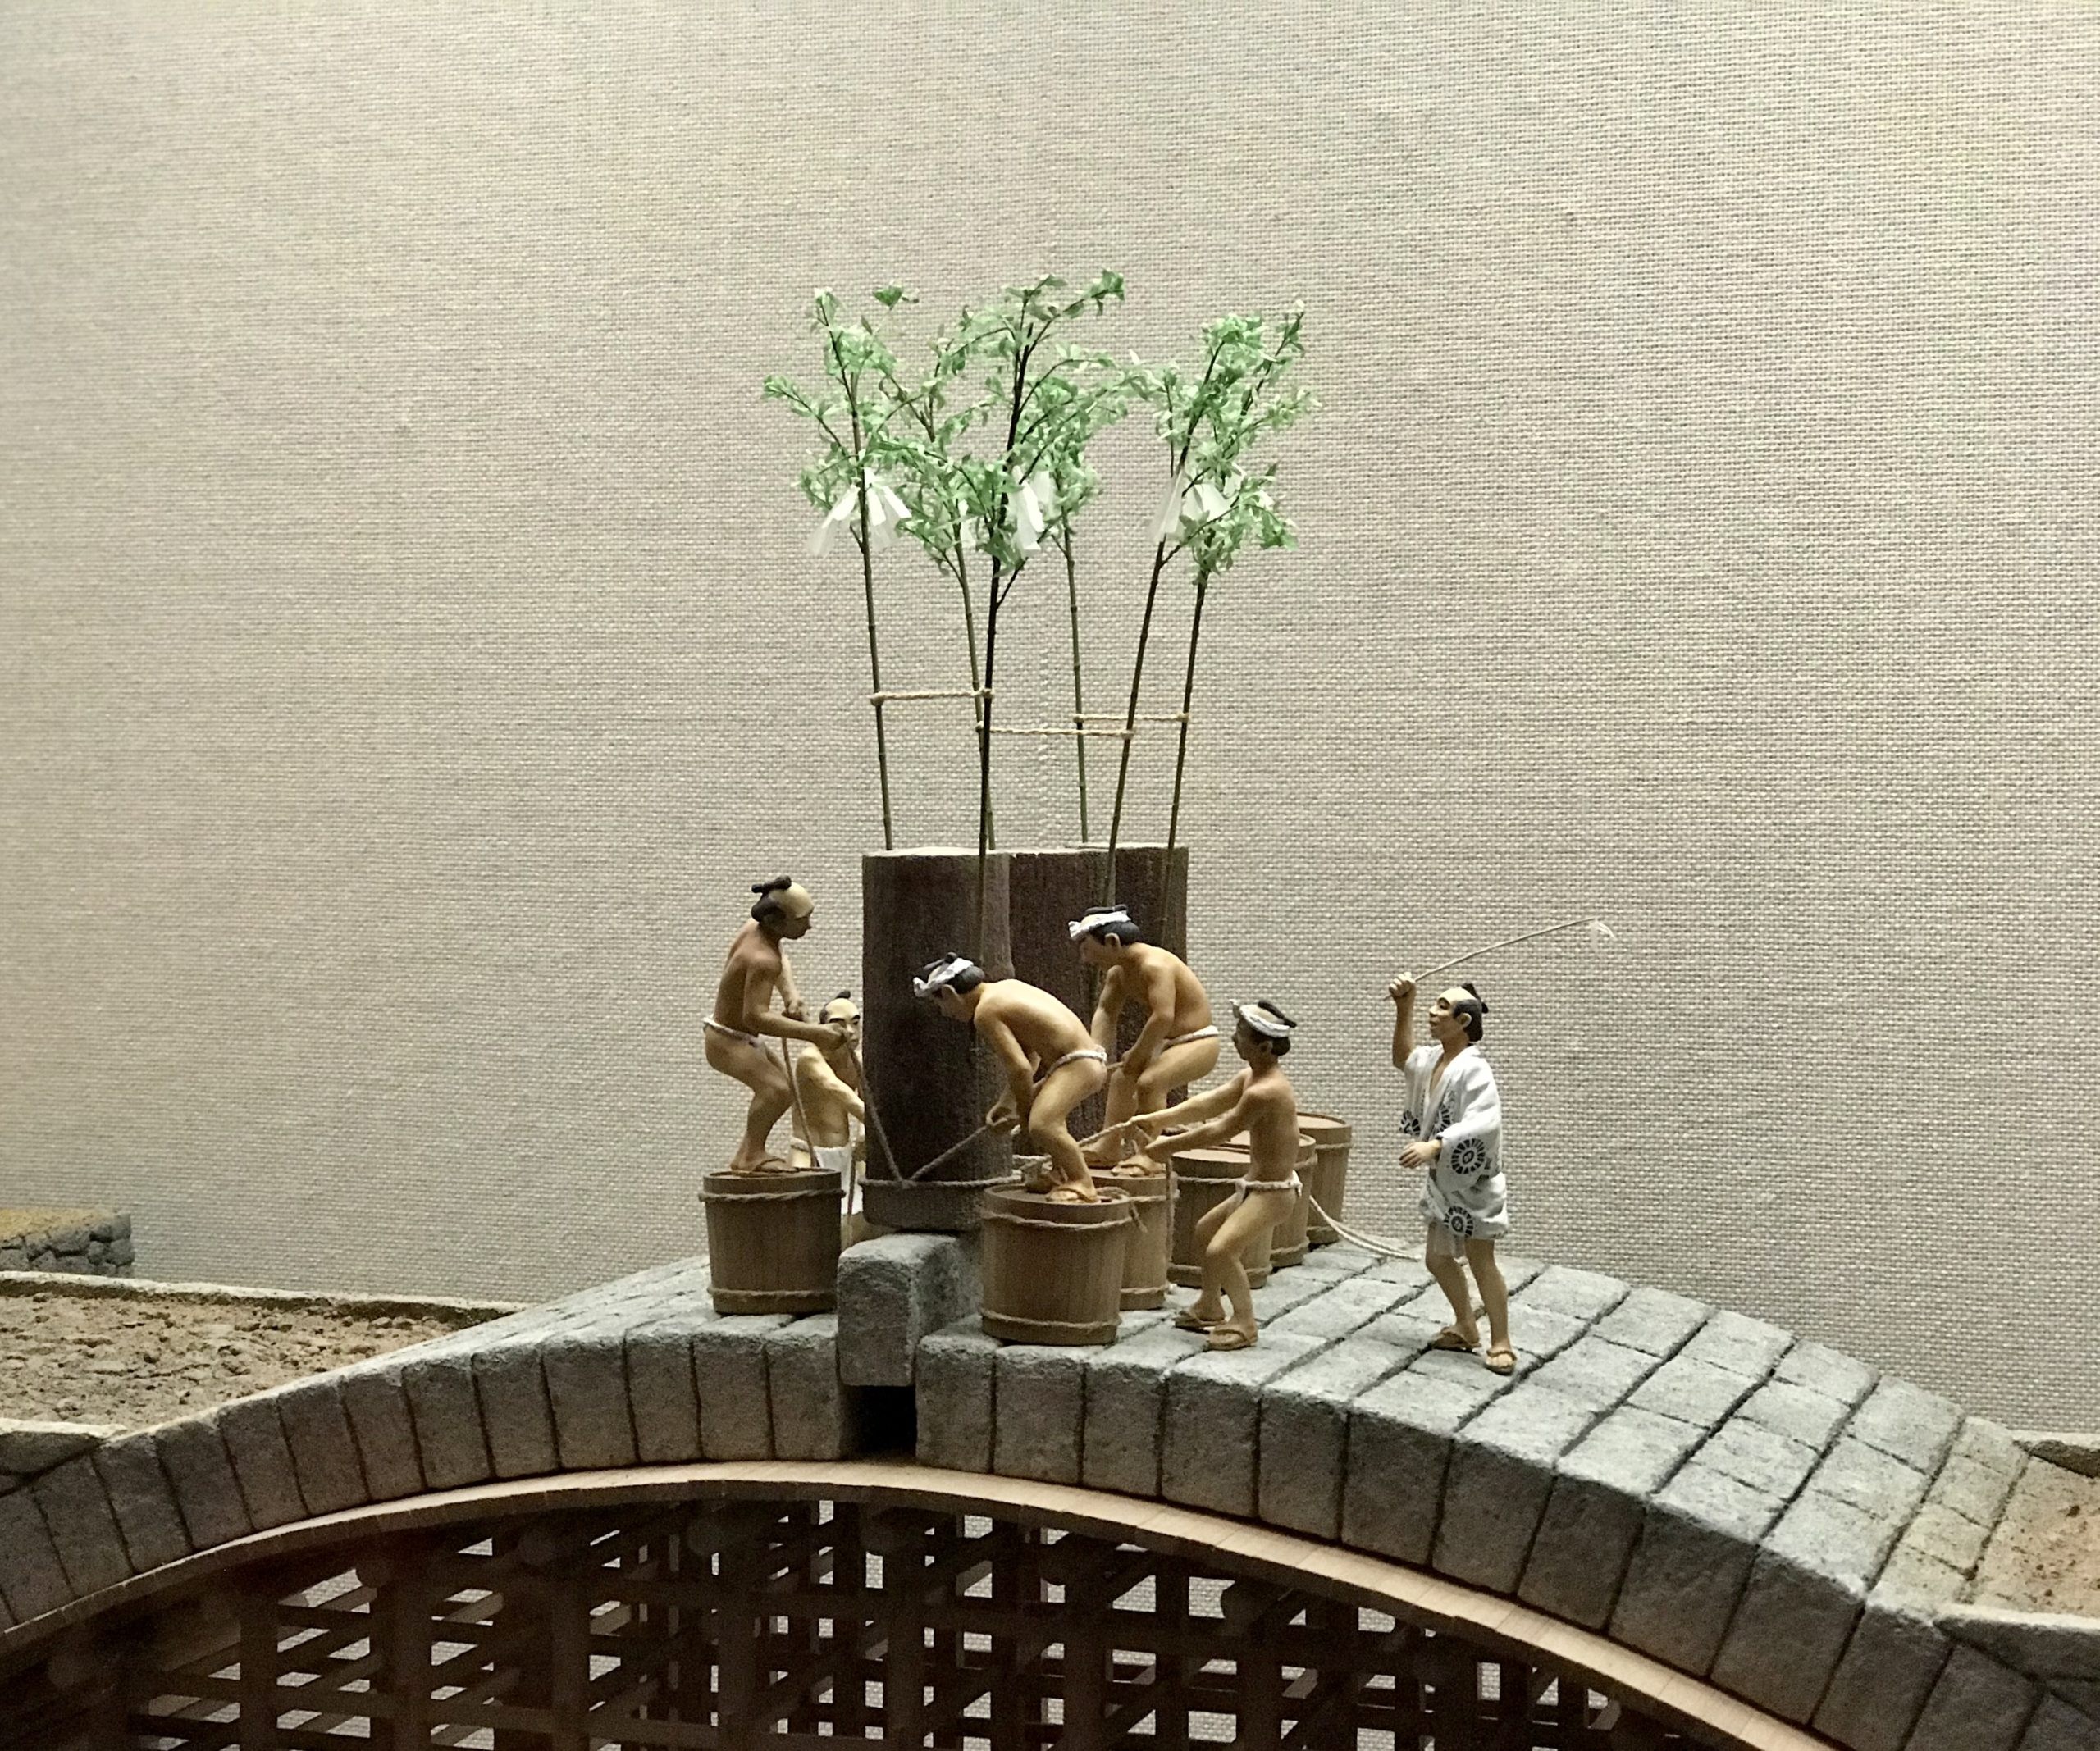 Miniature du musée de Nagasaki